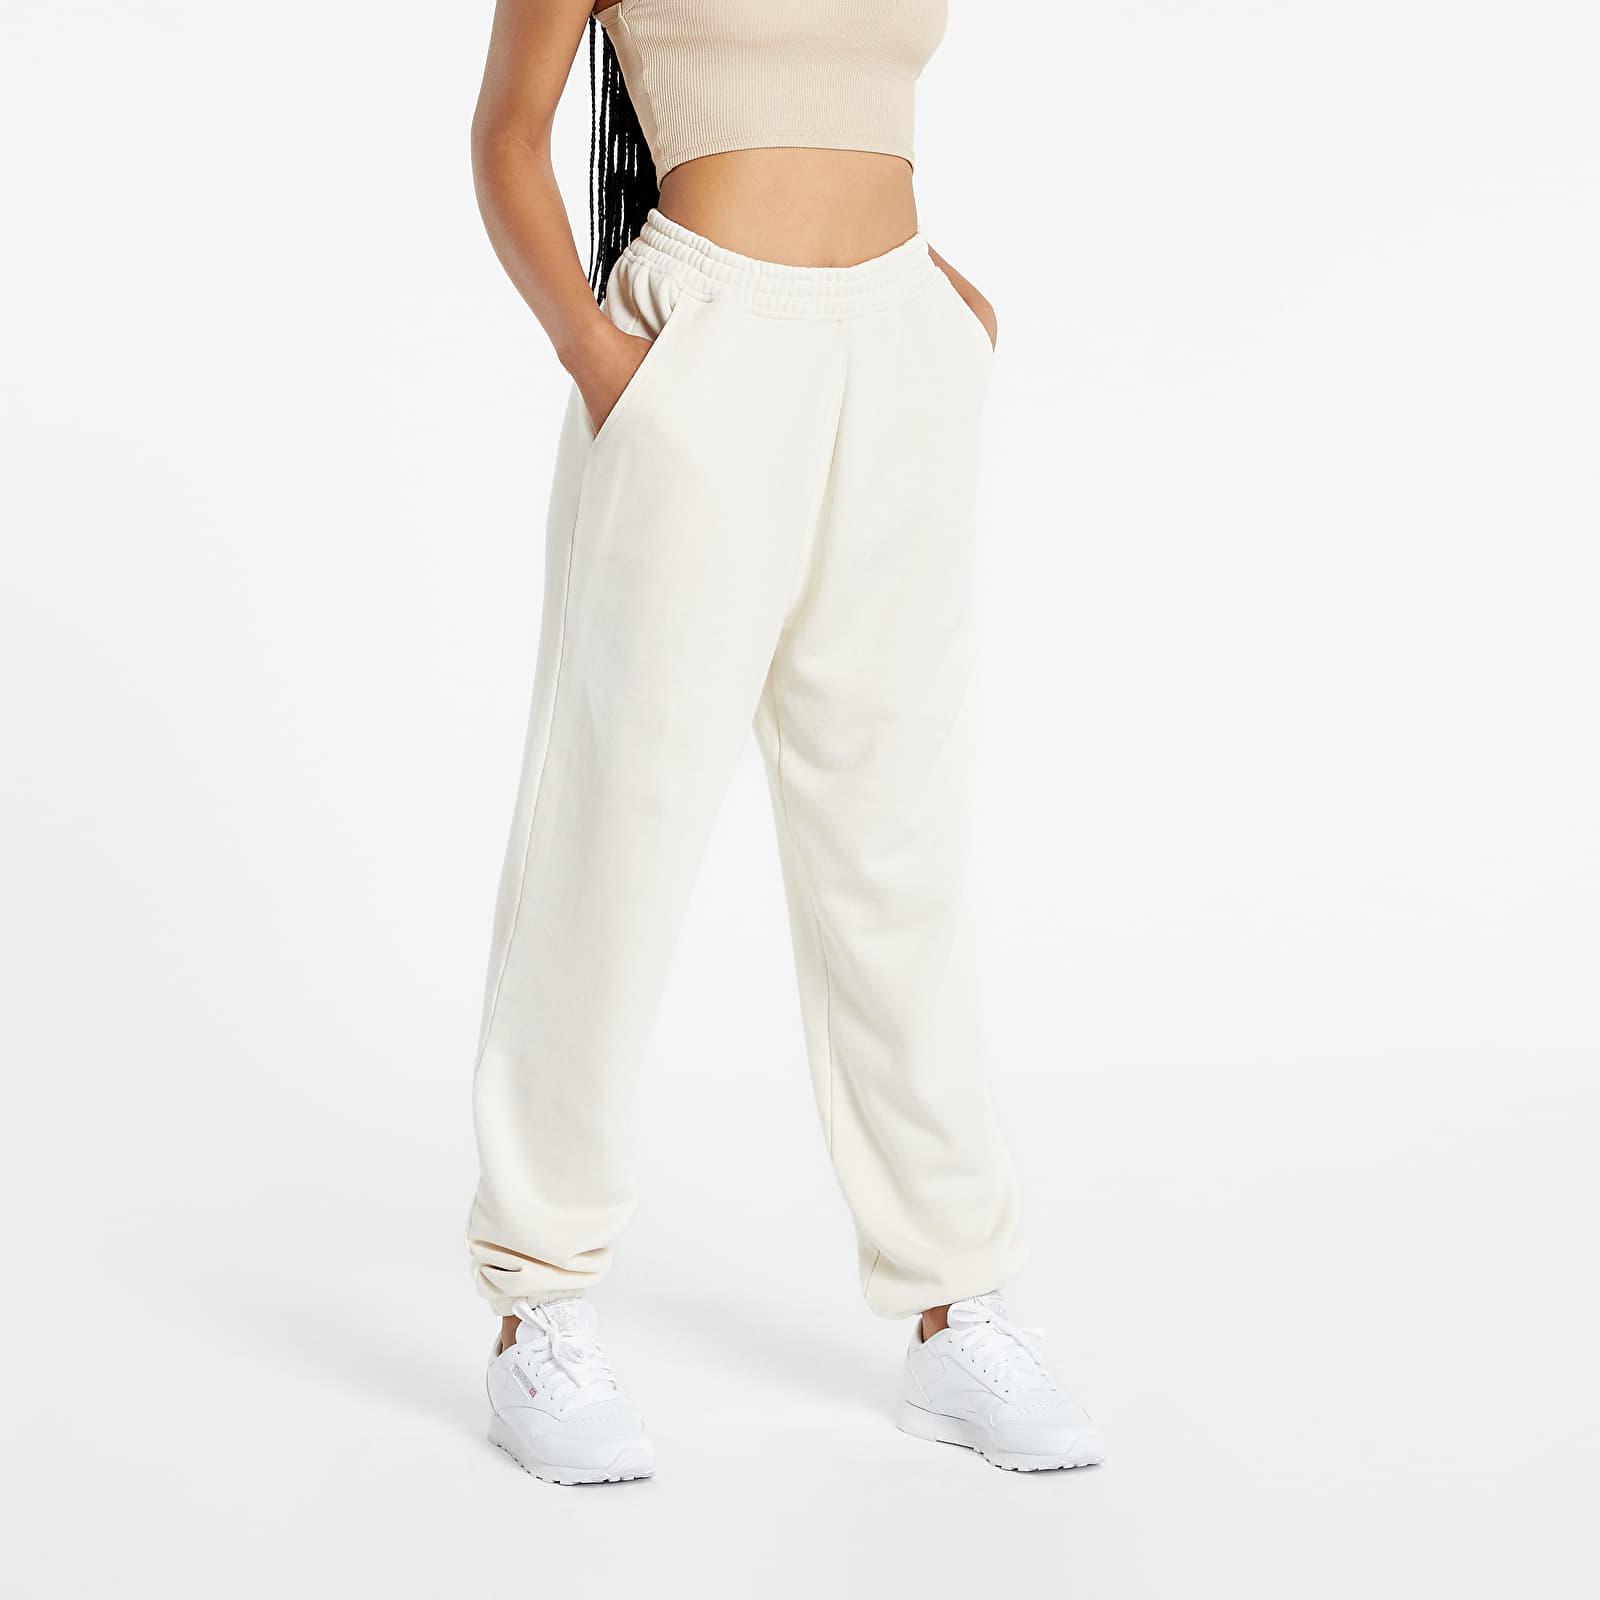 Reebok Classics Rbk Nd Ft Pants Nondye